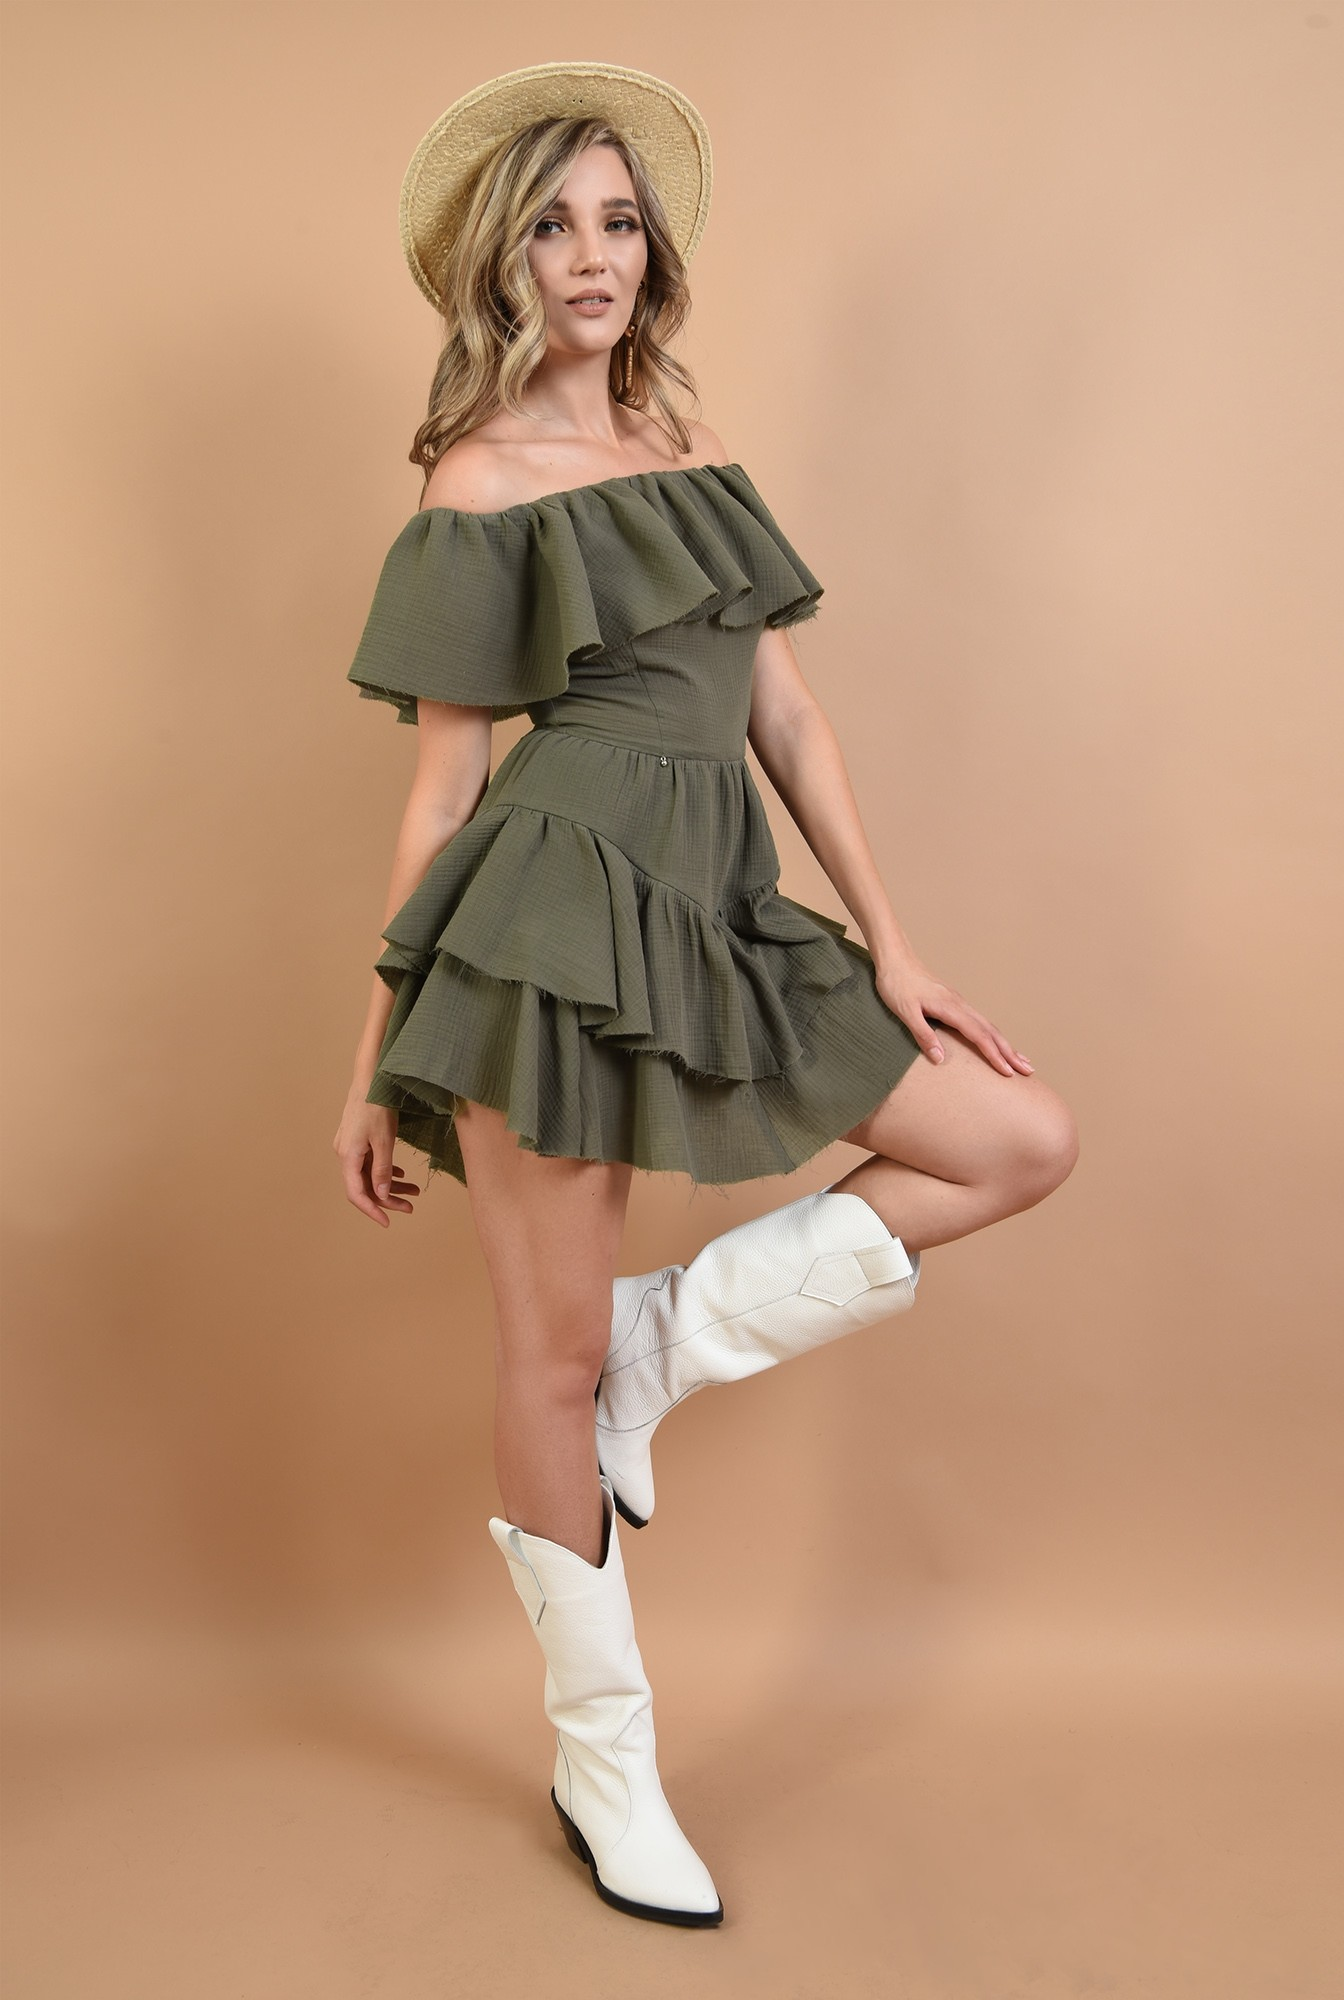 0 - 360 - rochie din bumbac, kaki, cu volane, Poema